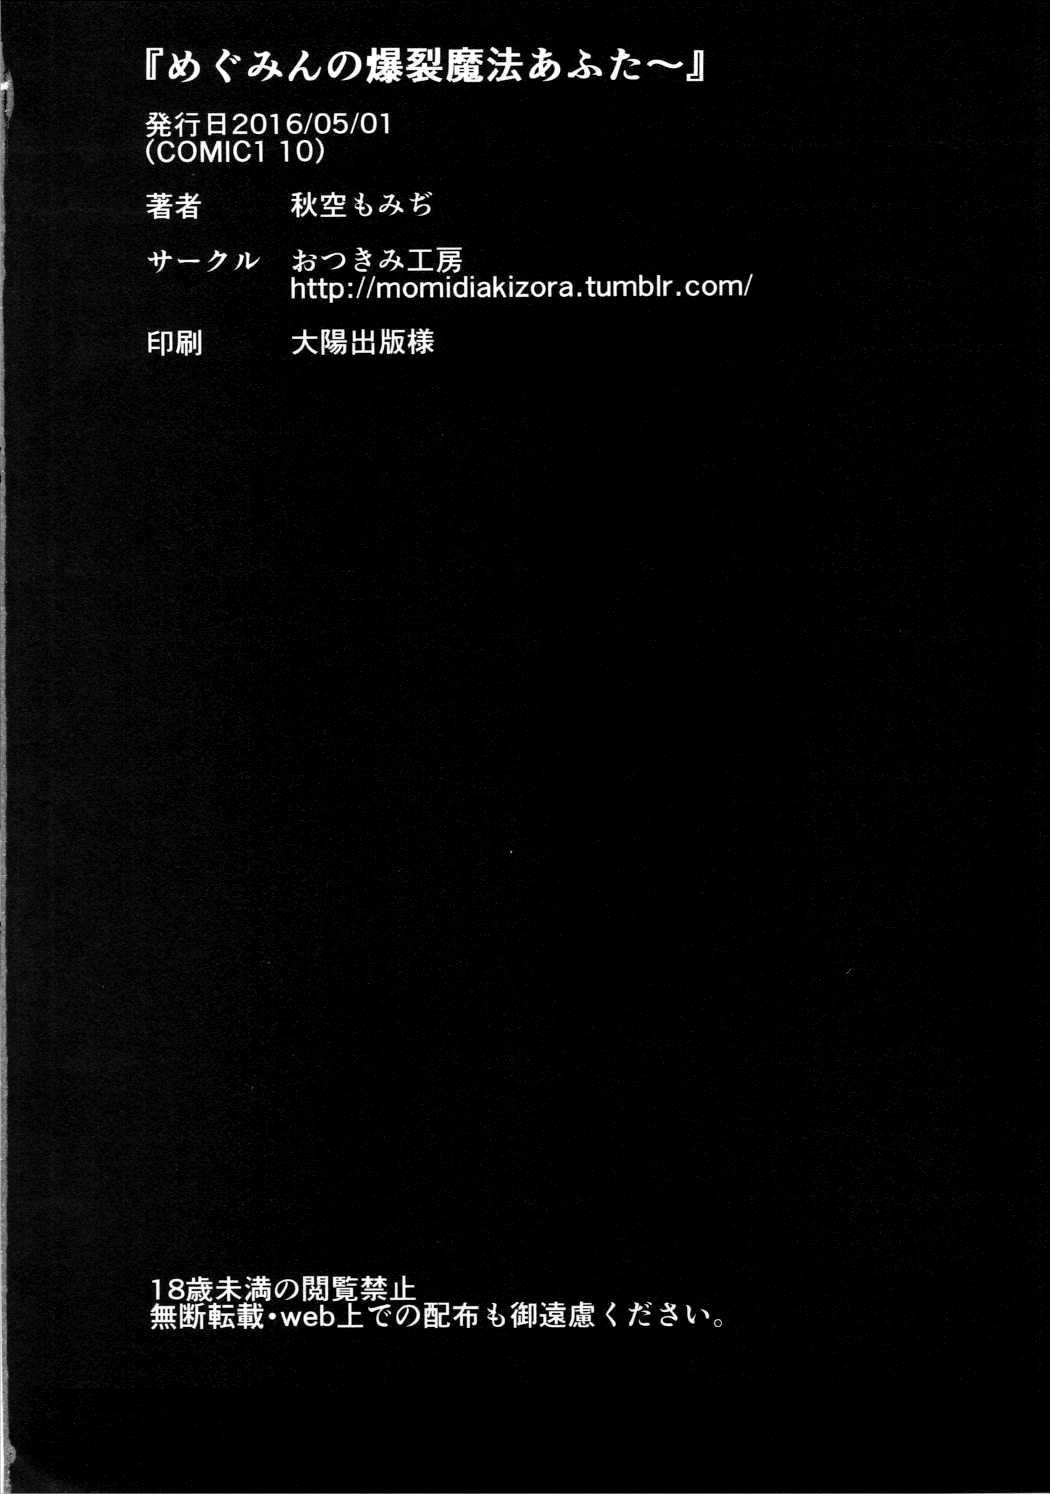 Megumin no Bakuretsu Mahou After | Megumin's Explosion Magic After 20